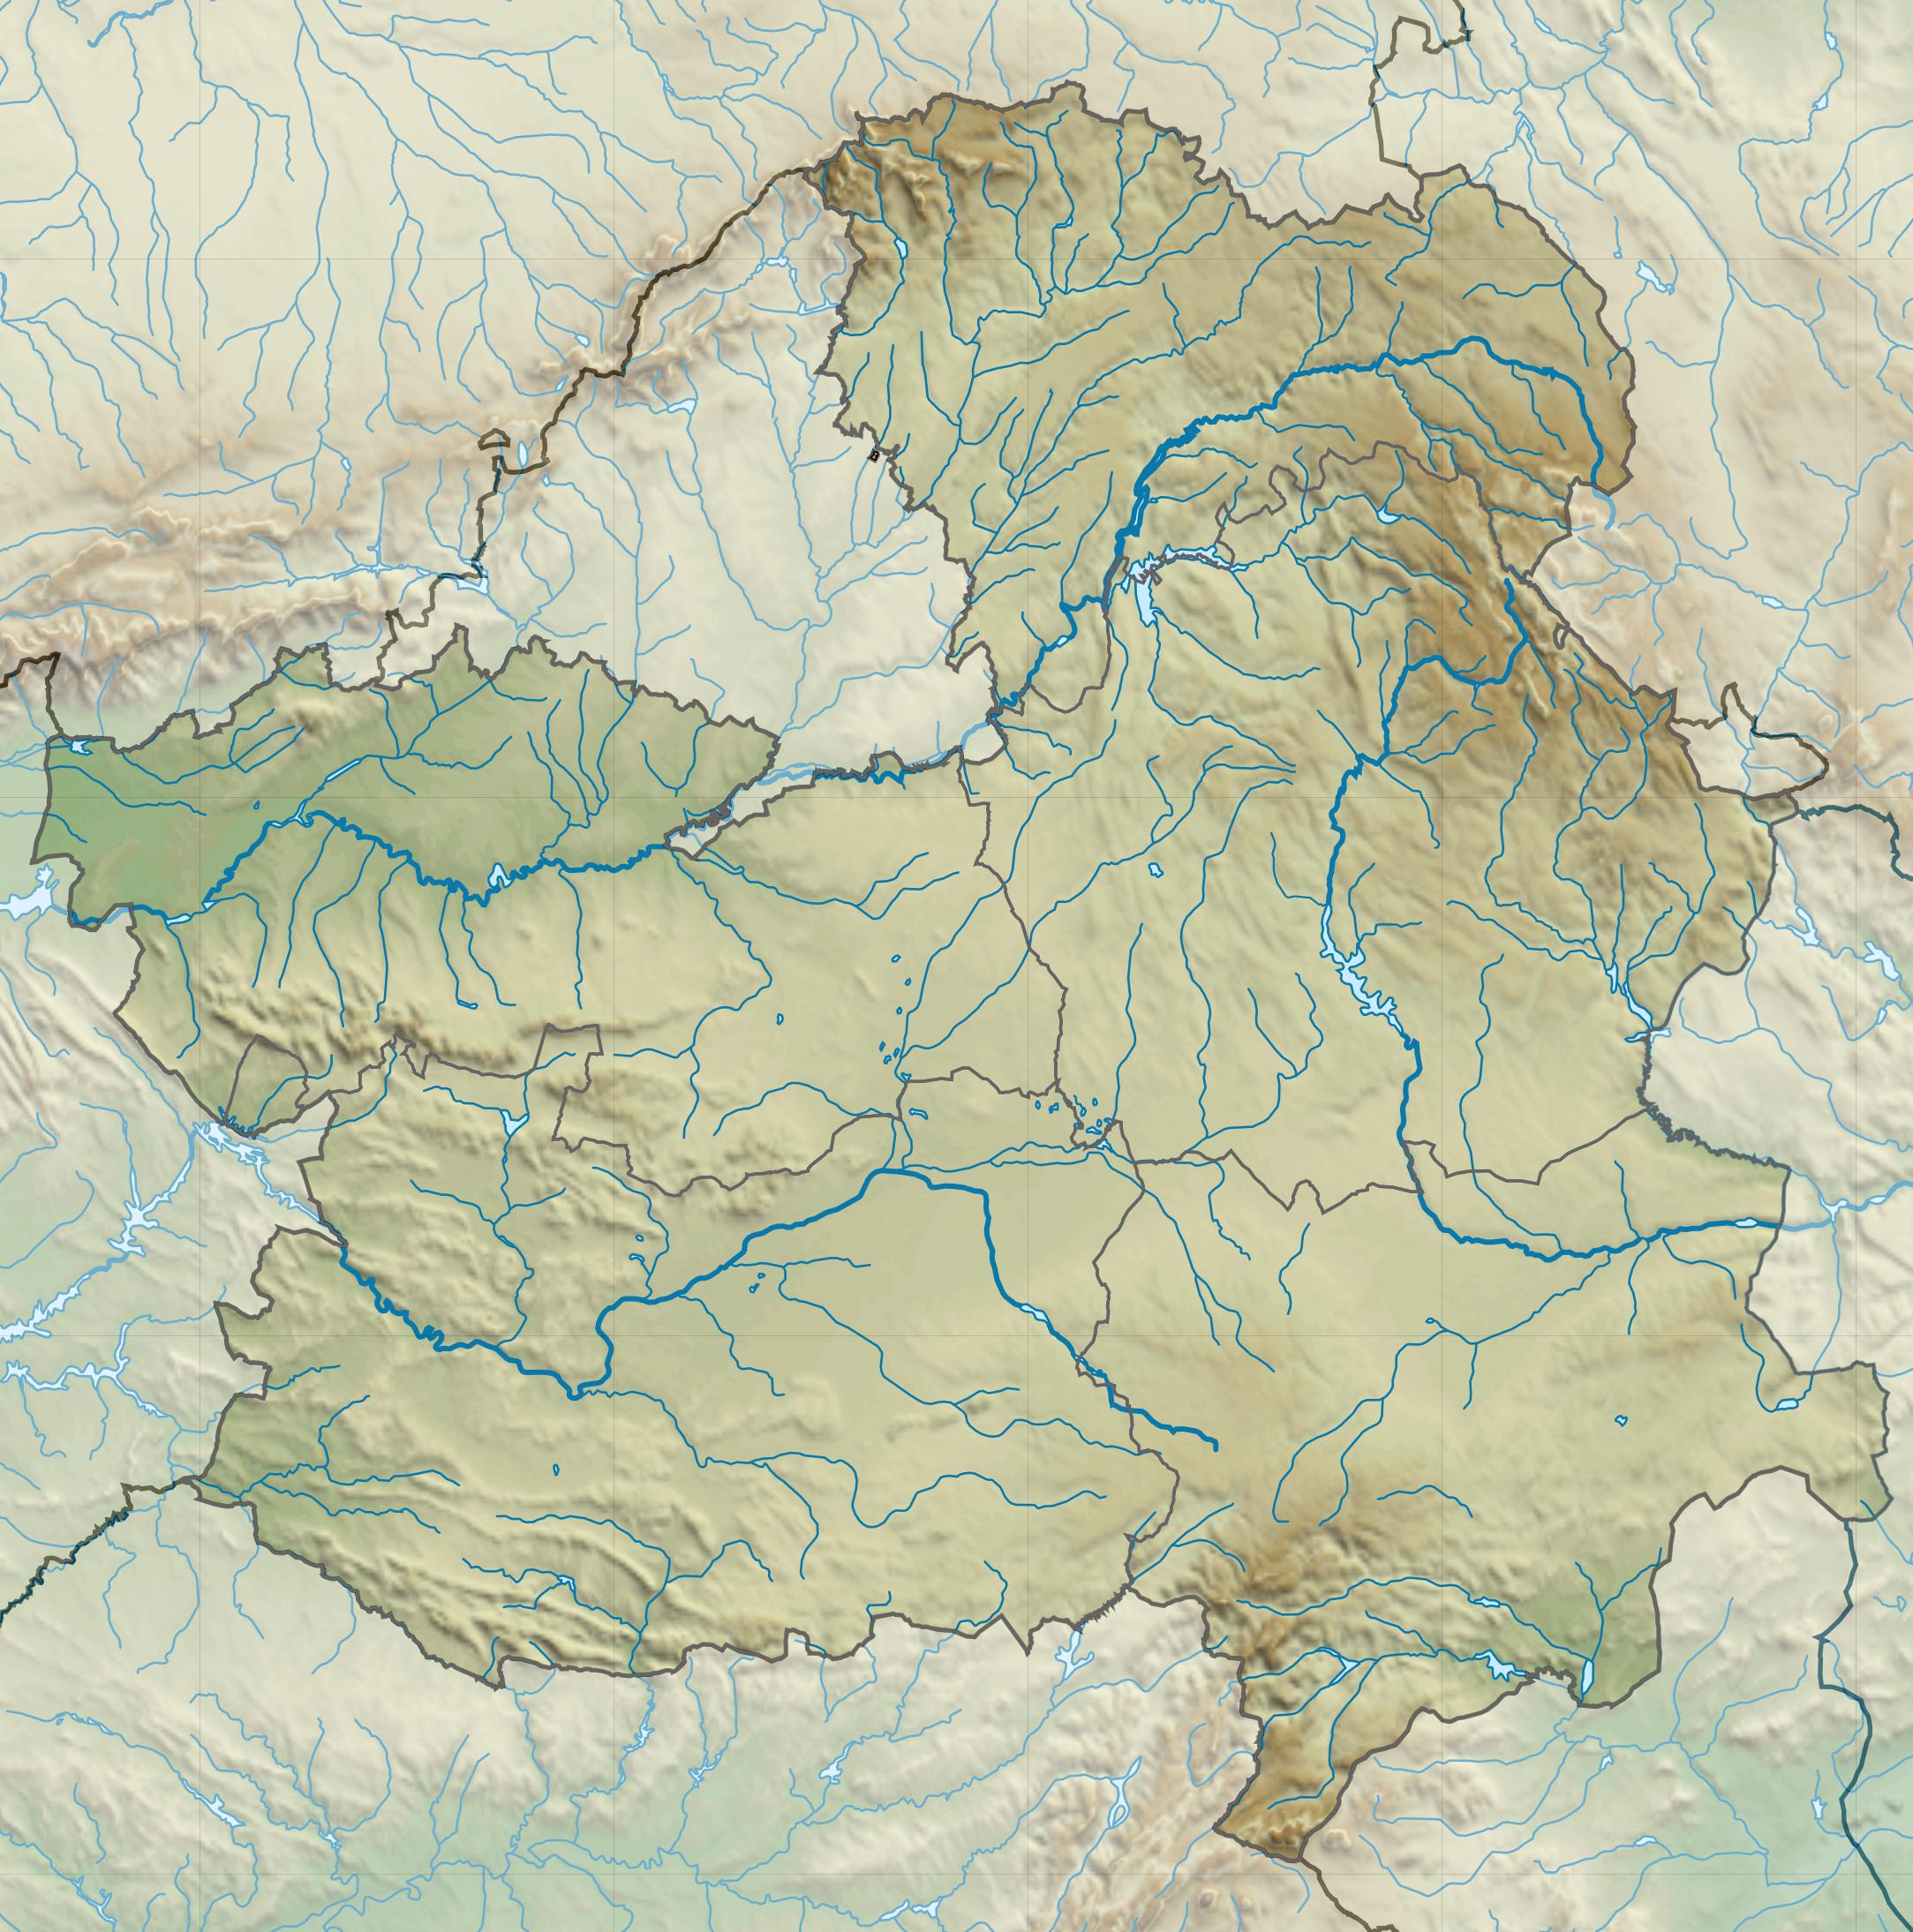 La Mancha Spain Map.File Spain Castile La Mancha Relief Map Png Wikimedia Commons